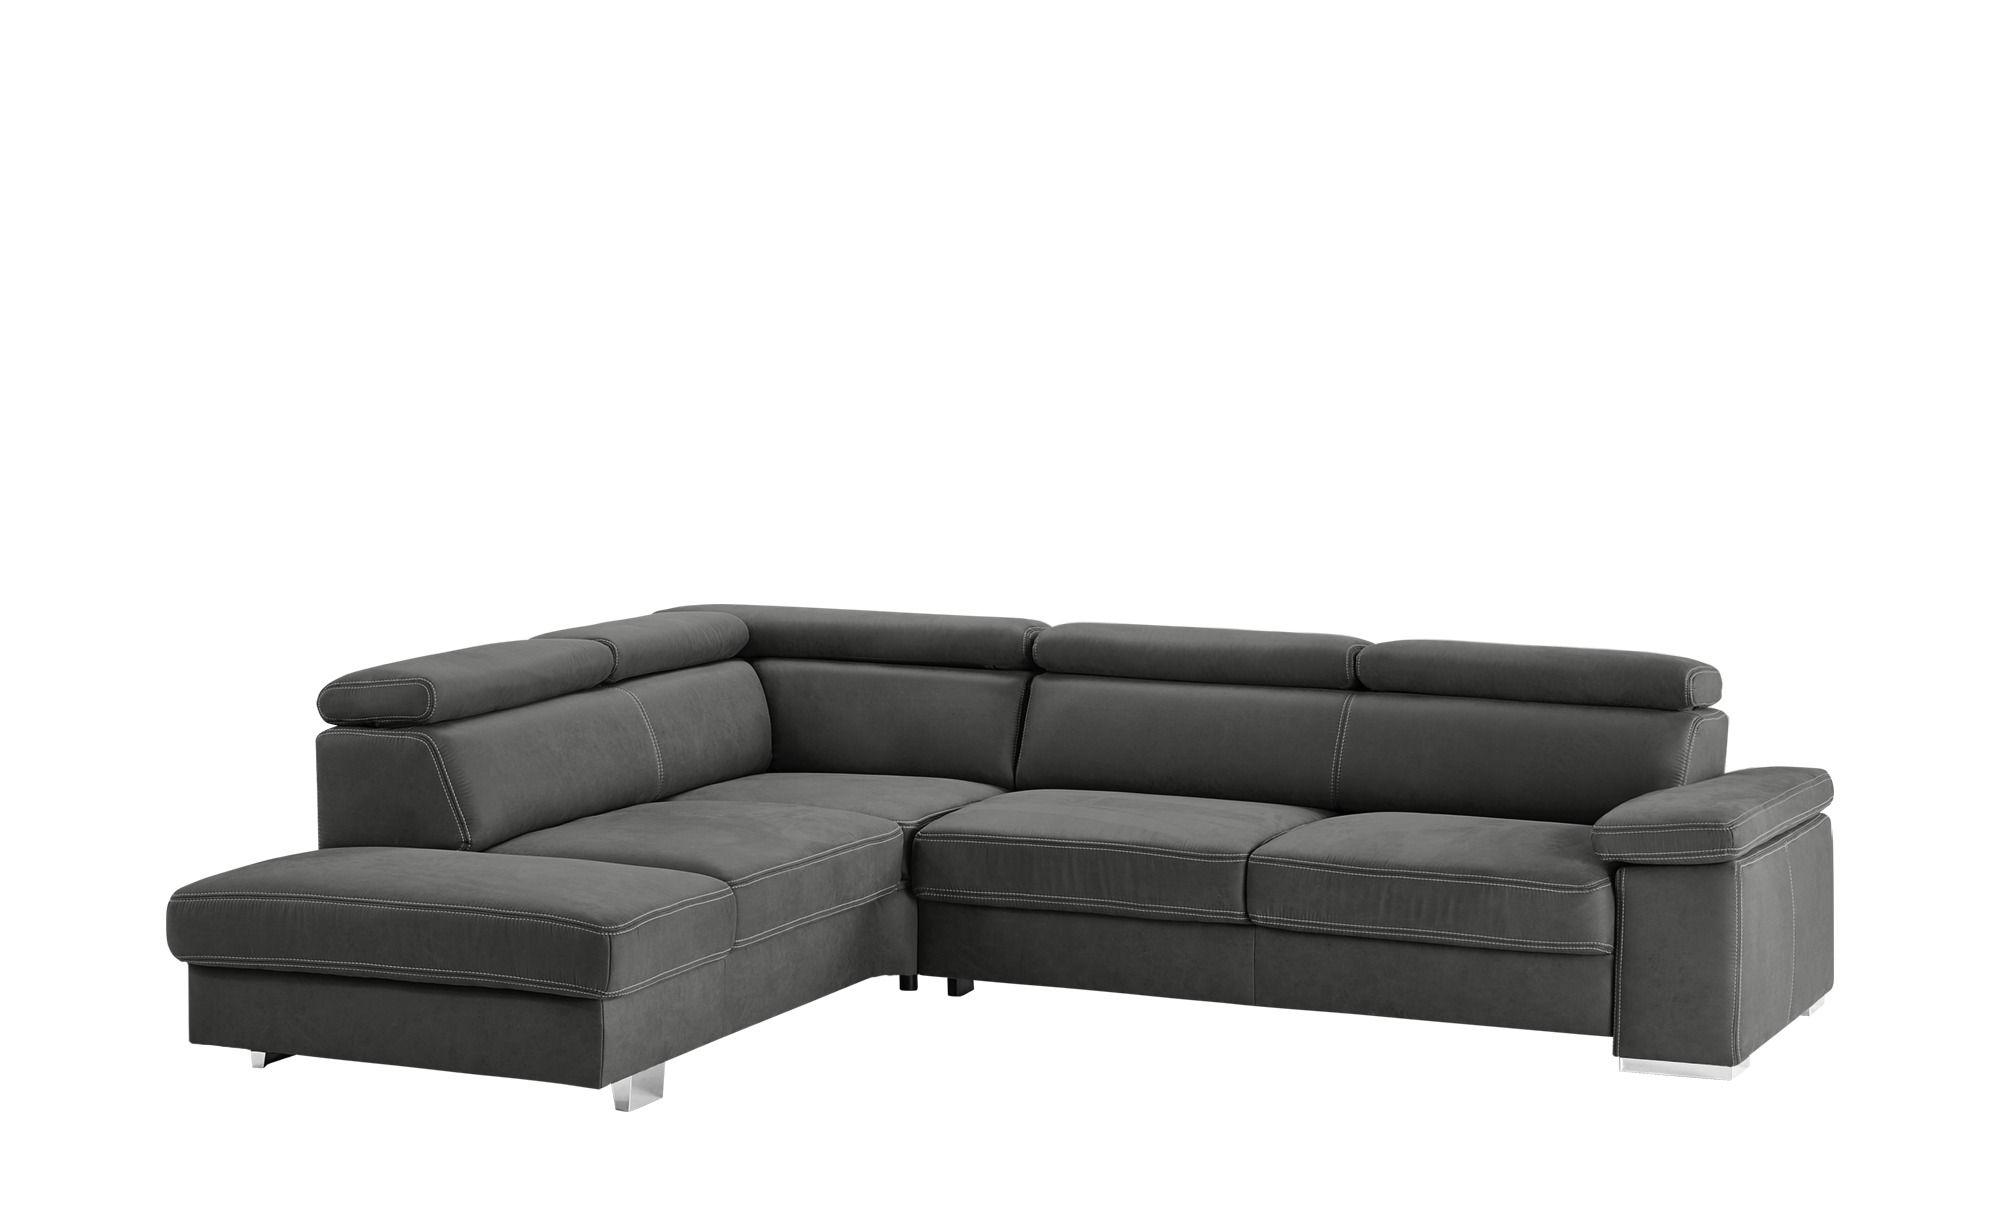 Meinsofa Ecksofa Grau Mikrofaser Nadja Couch Furniture Decor